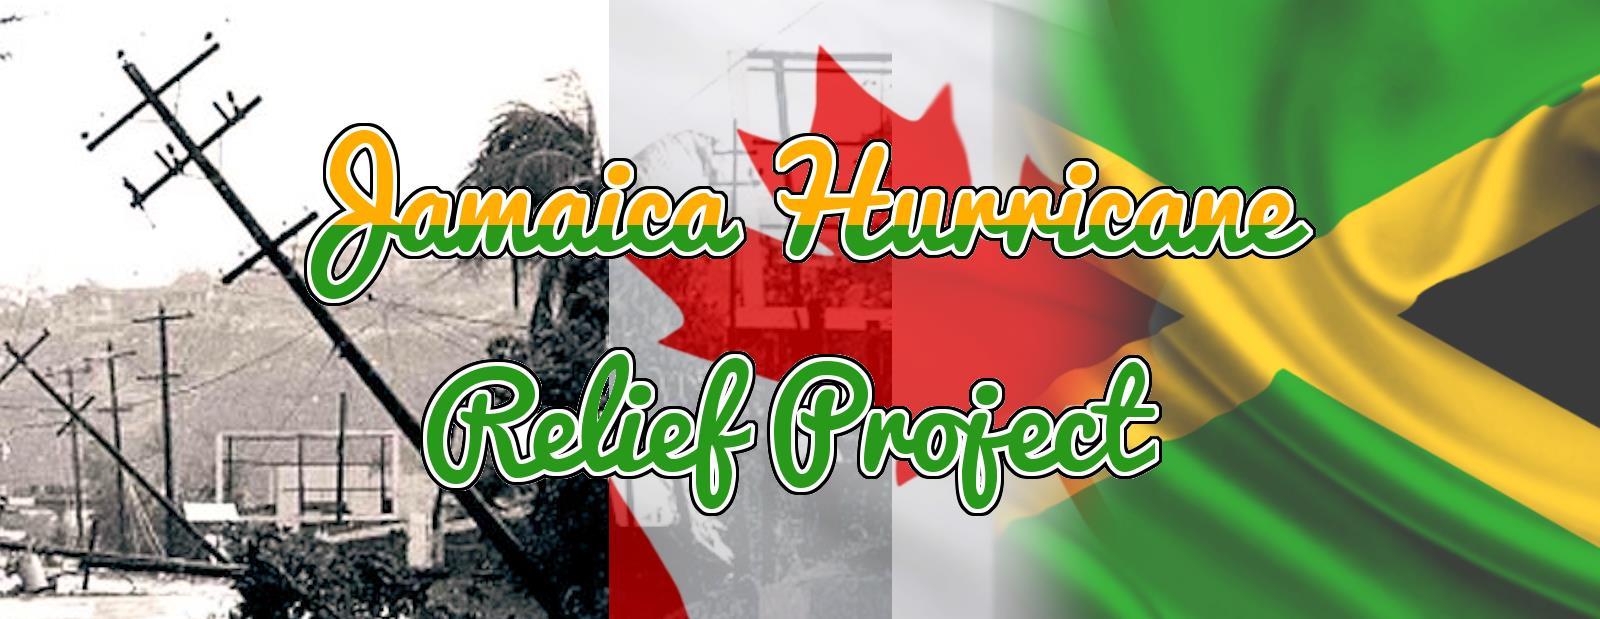 Jamacian Hurricaine Relief Project 1988-1989